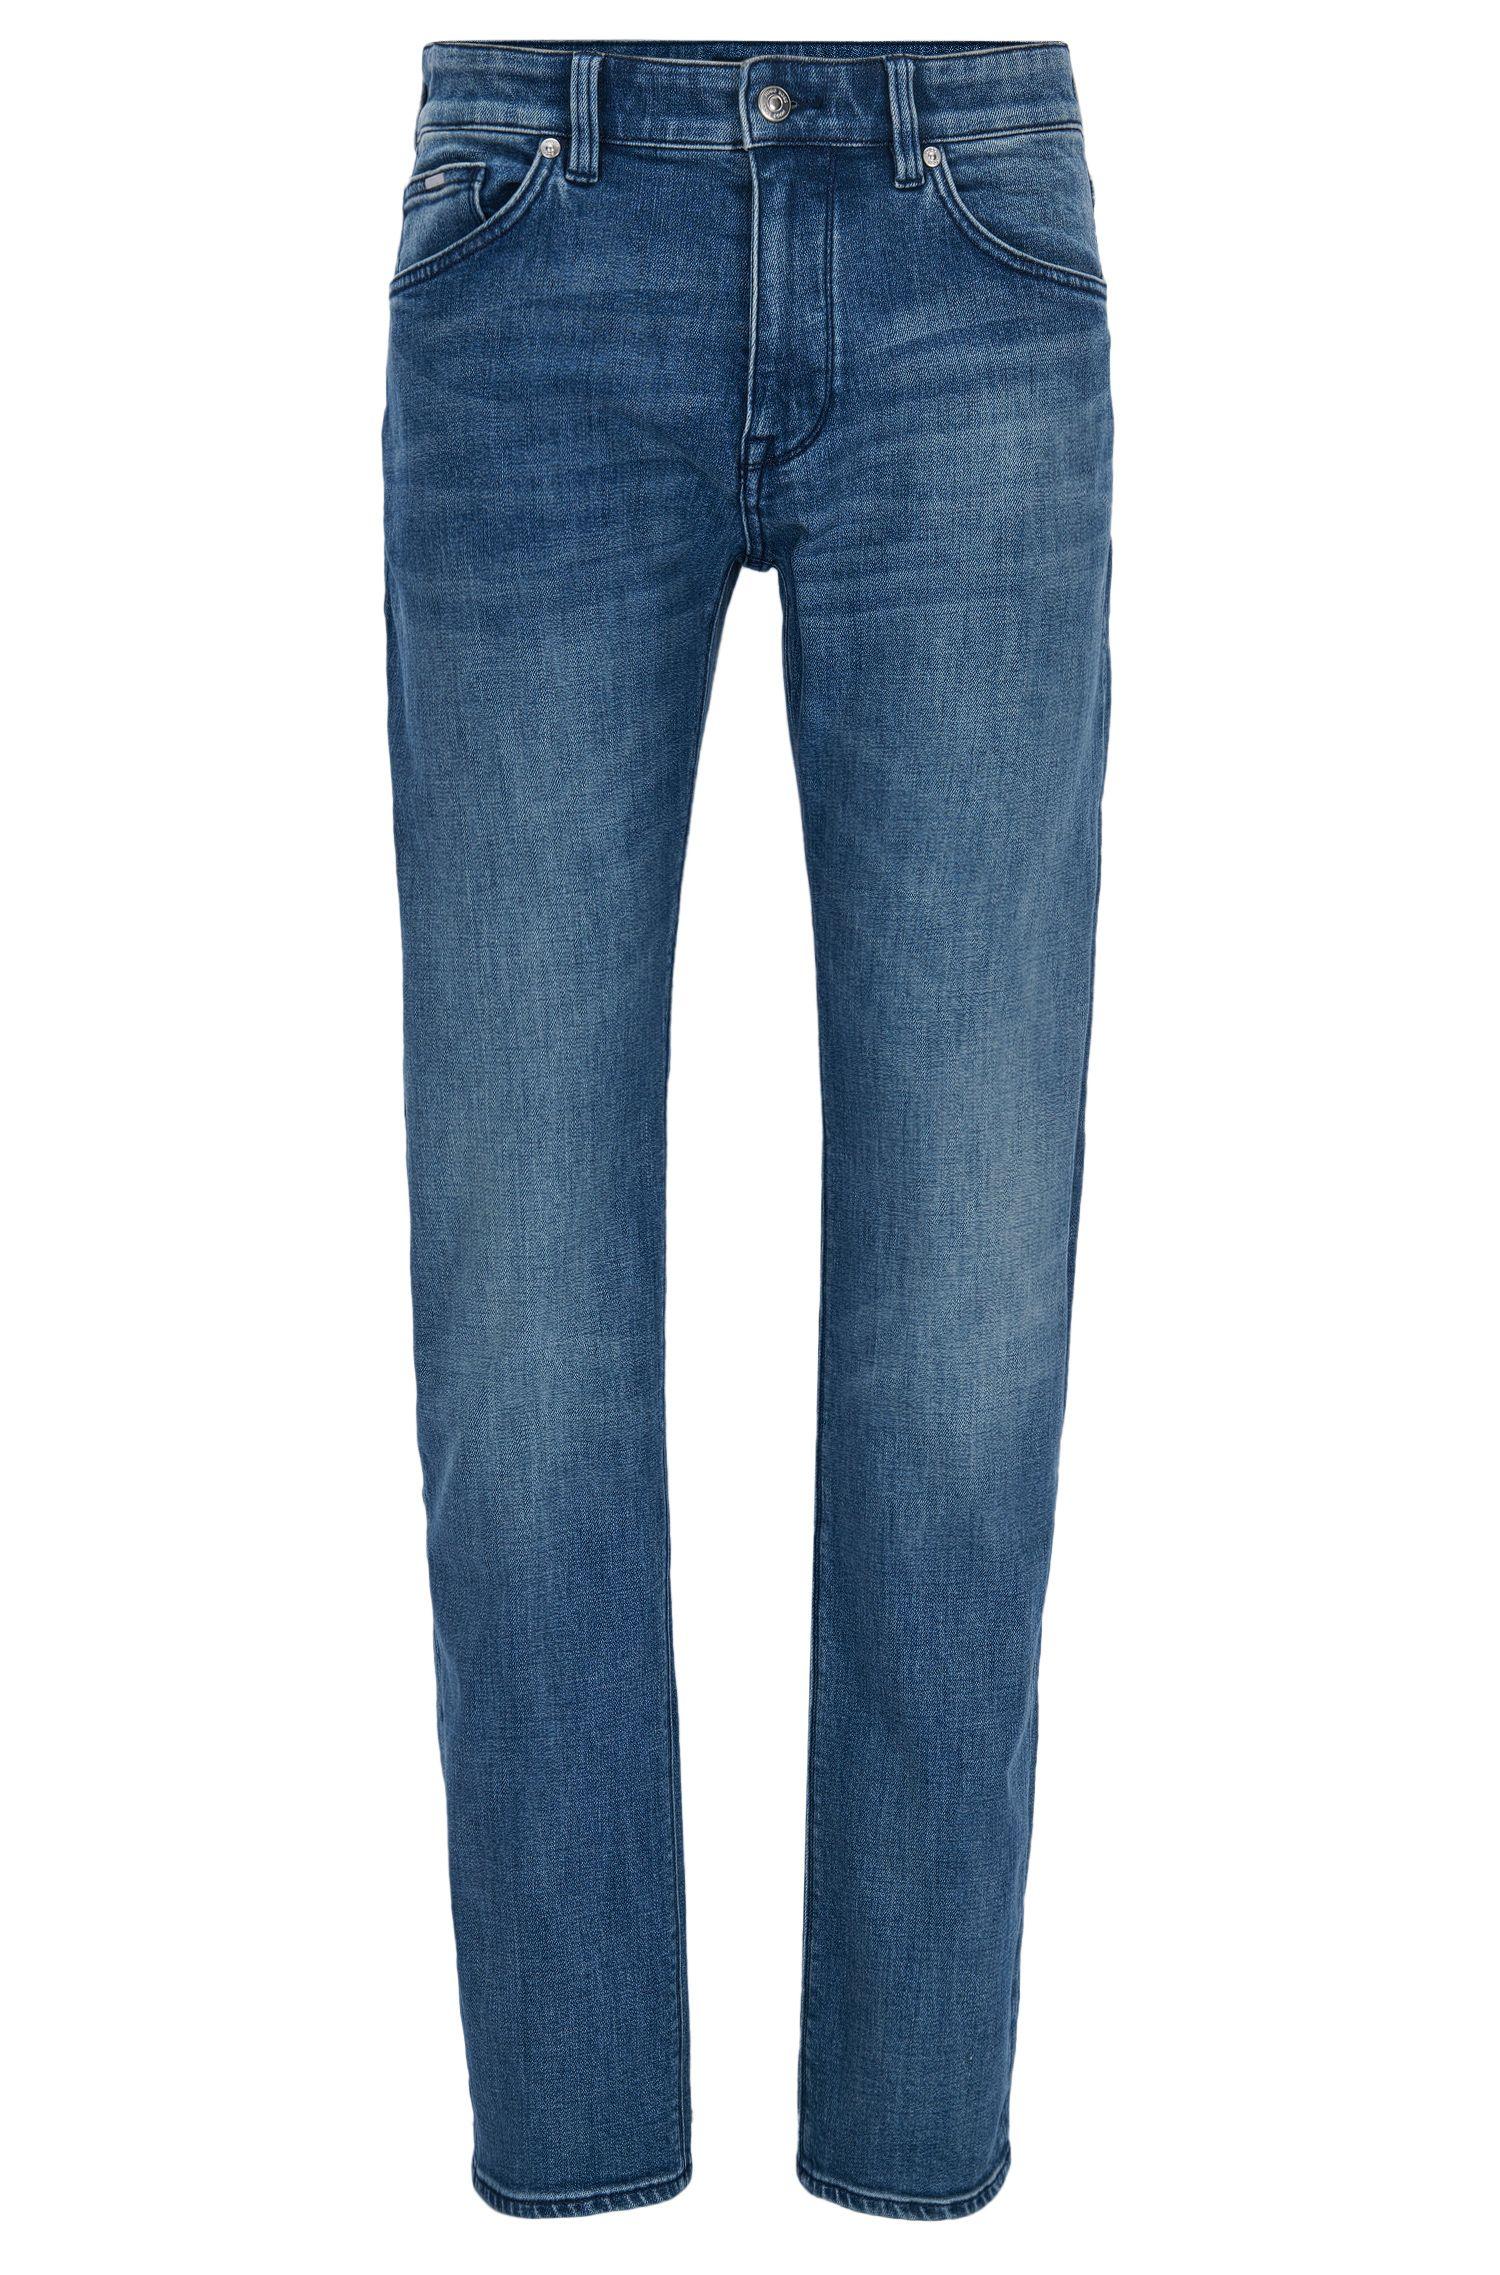 Donkerblauwe regular-fit jeans van distressed stretchdenim